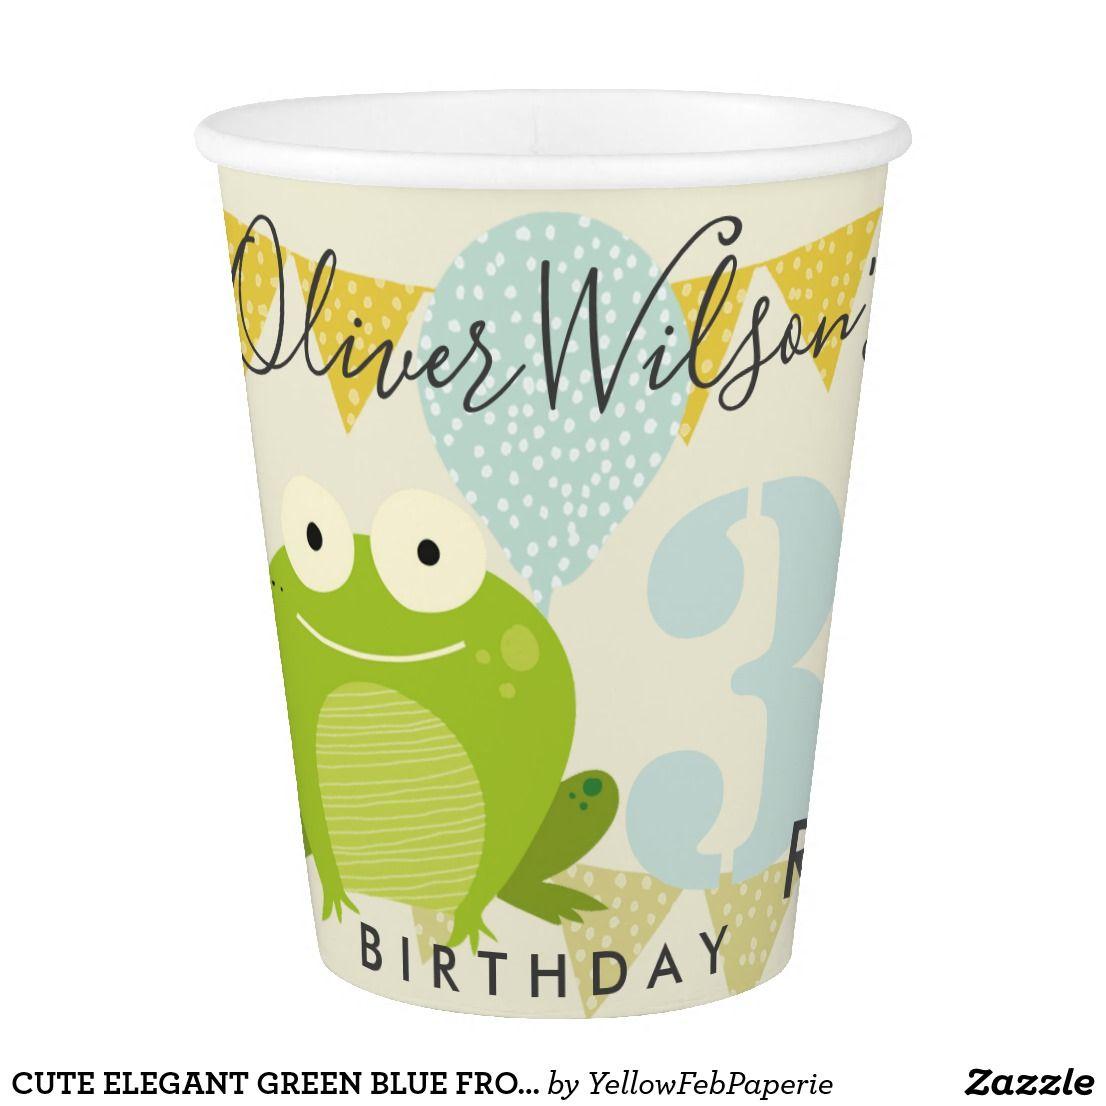 Cute Elegant Green Blue Frog Birthday Celebration Paper Cup